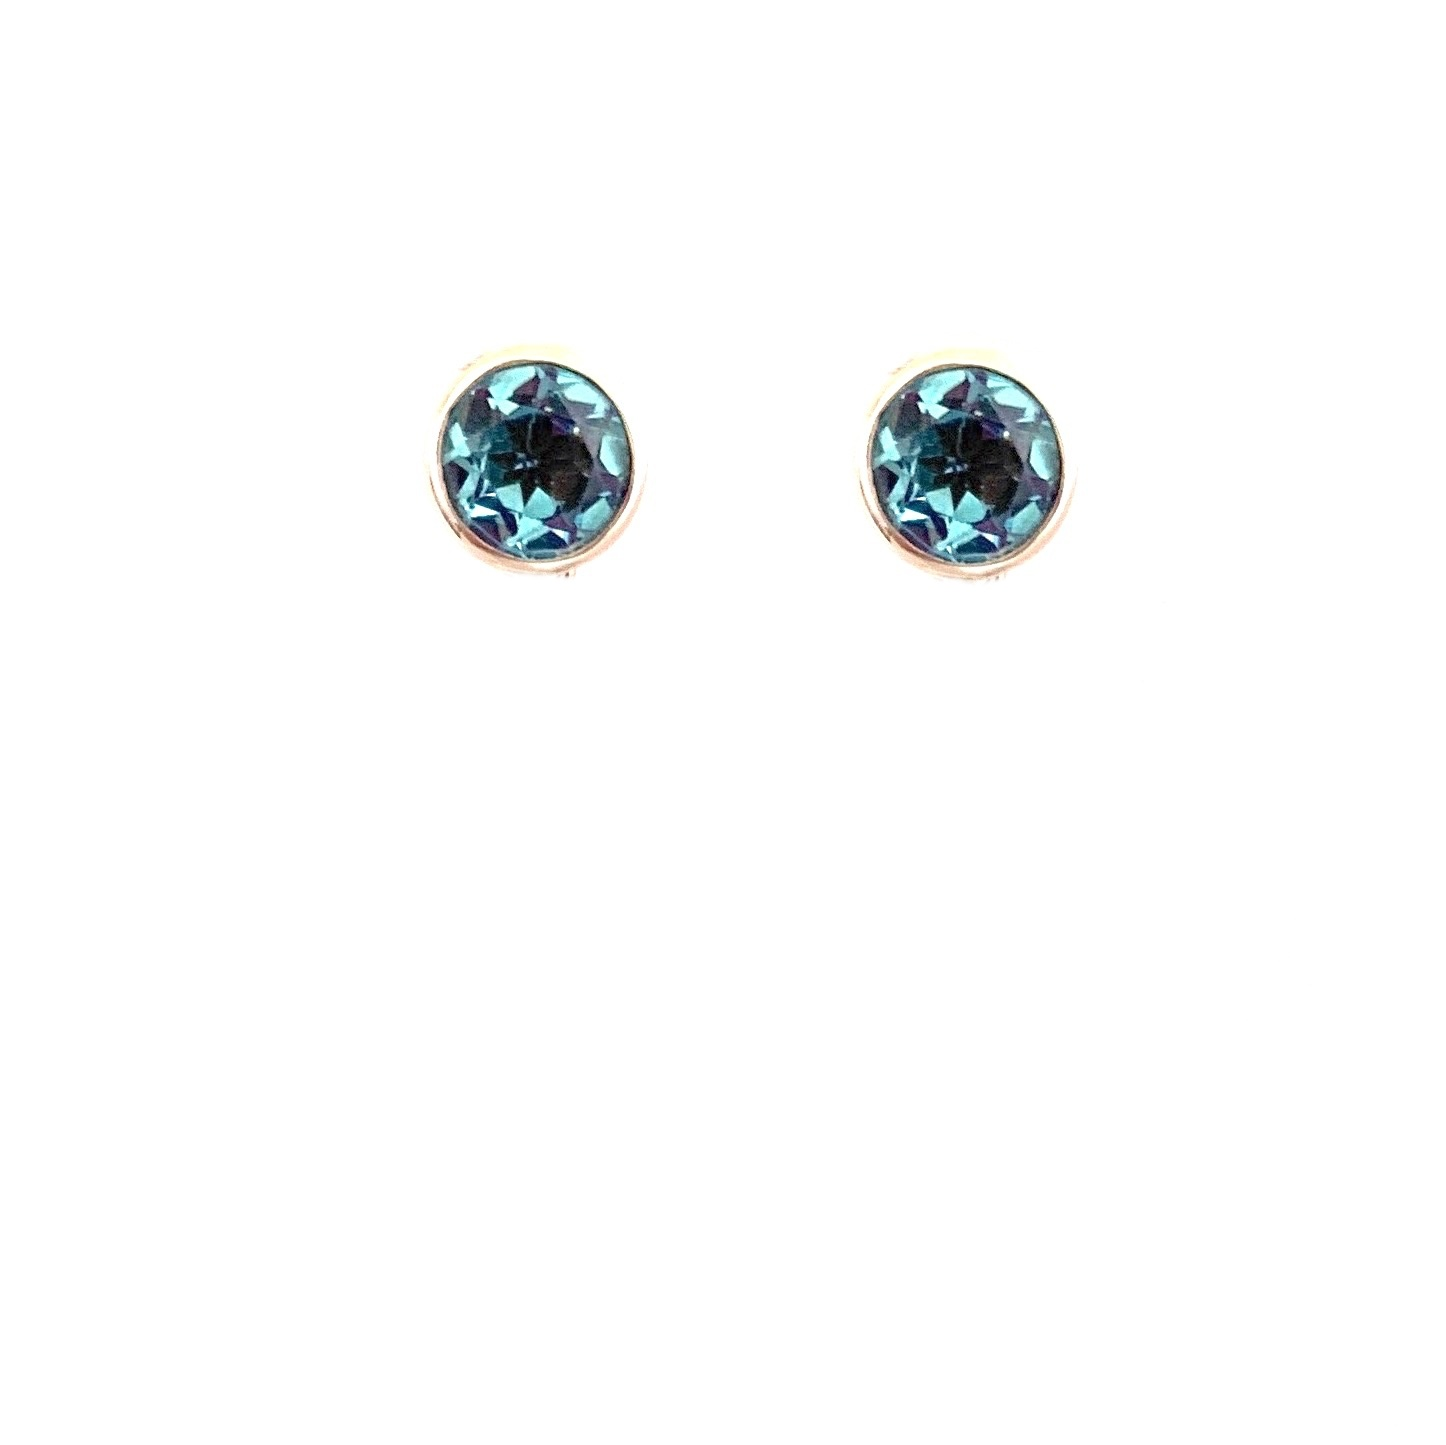 Changeable earrings Earrings sleeping beauty turquoise and blue topaz